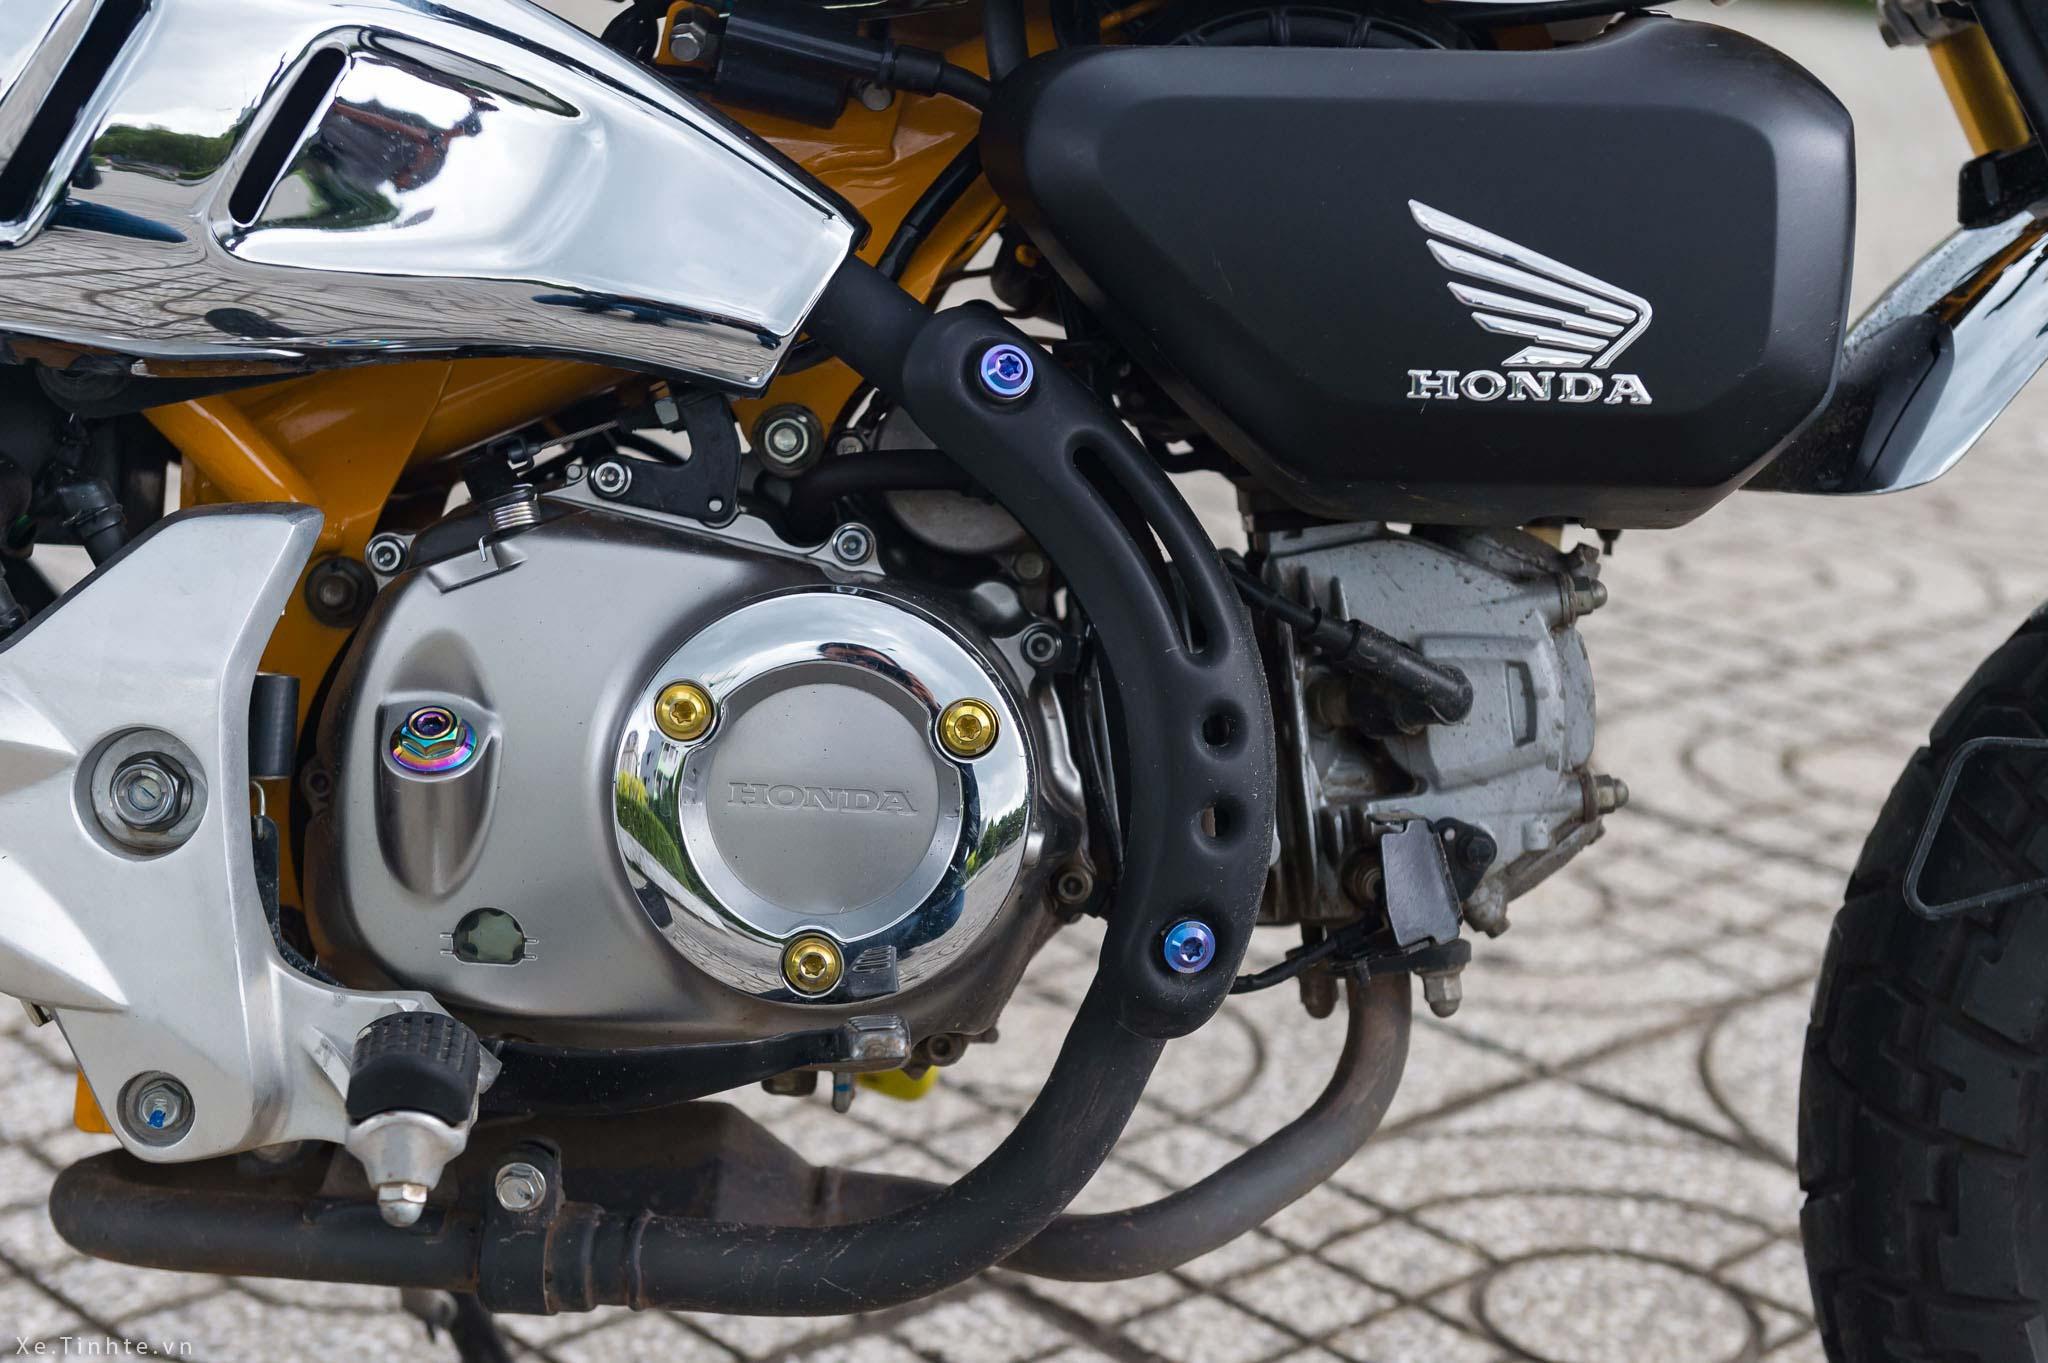 Honda_Monkey_125_Xe_Tinhte (25).jpg